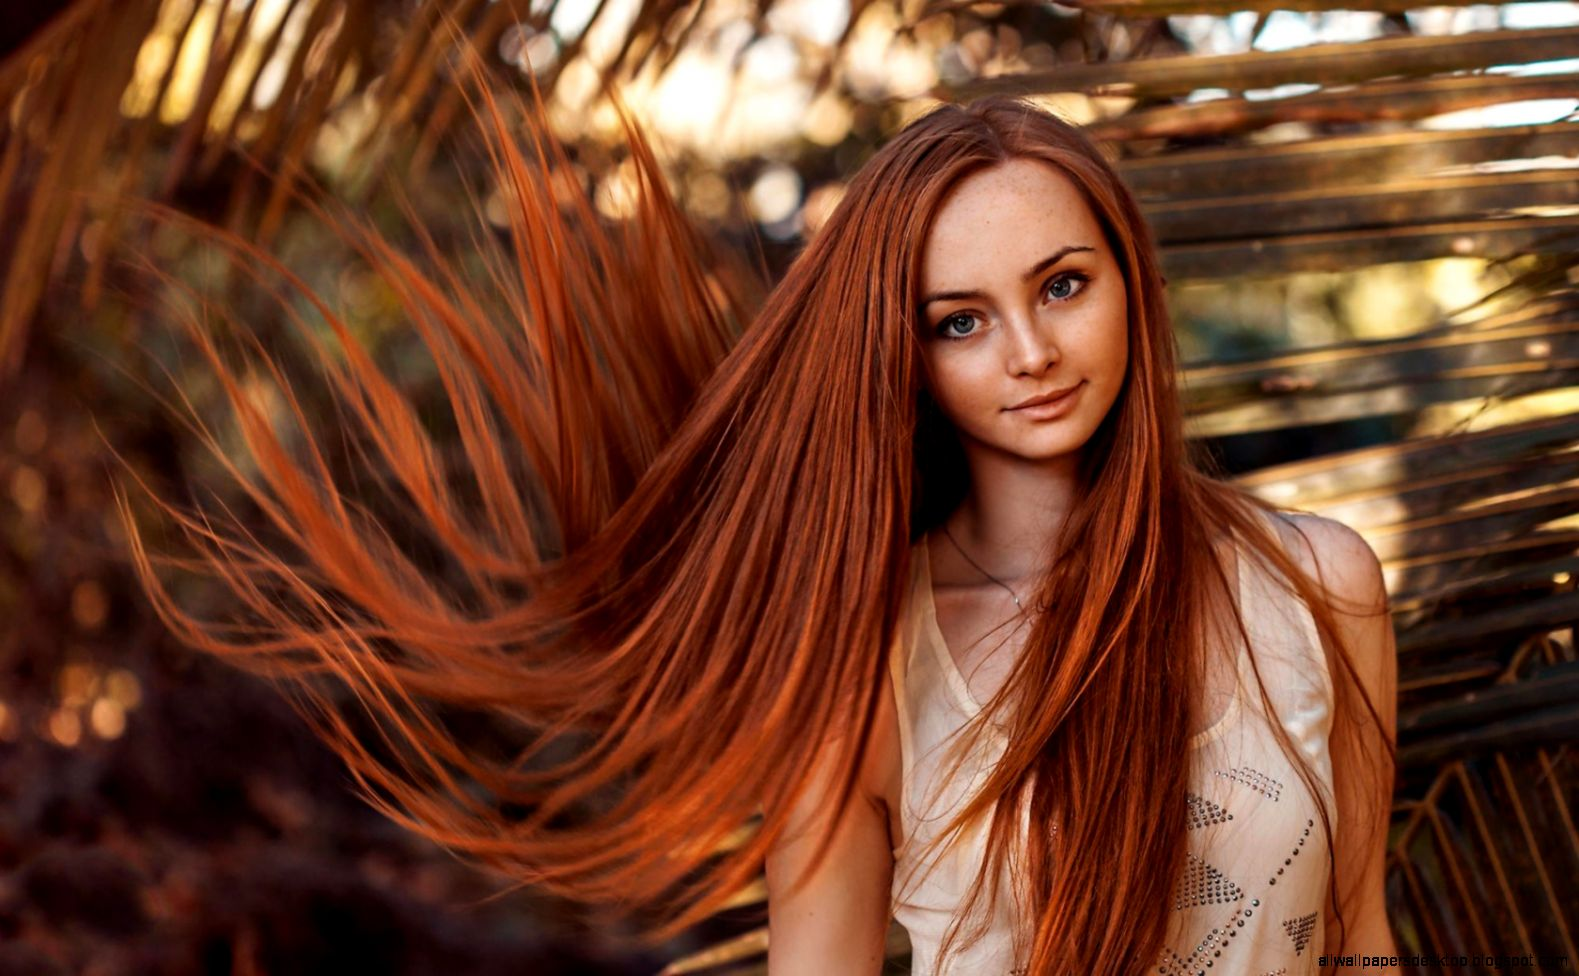 Lovely Girl Portrait Freckles Redhead Hair wallpaper  1680x1050